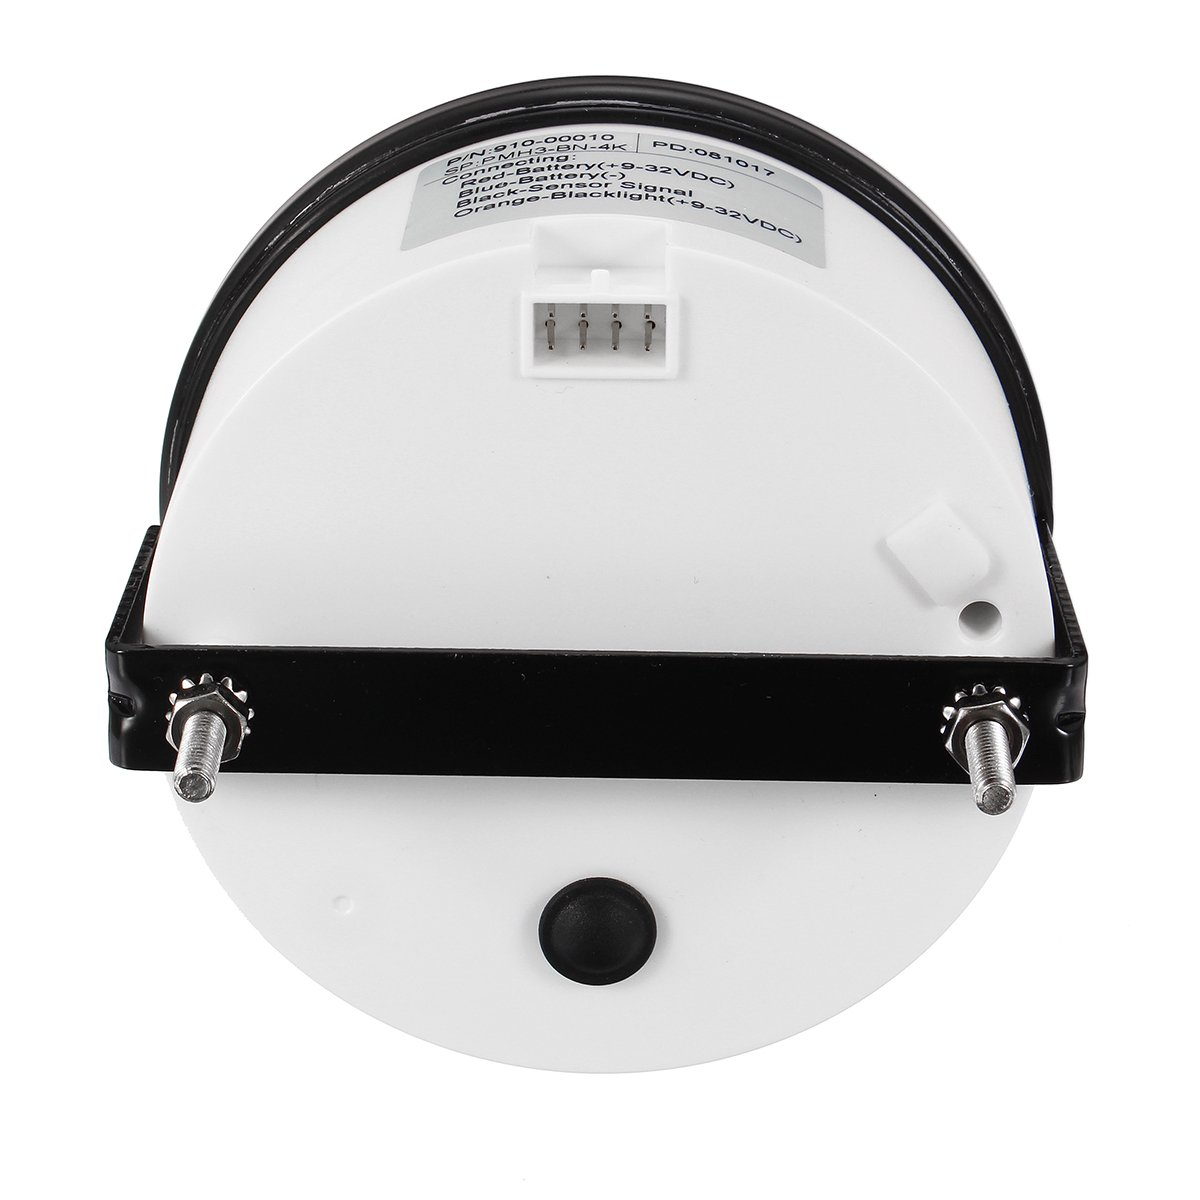 NeDonald 12/24V Marine Tachometer Boat Tacho Meter Gauge LCD Hourmeter 0-4000 RPM 85mm by NeDonald (Image #4)